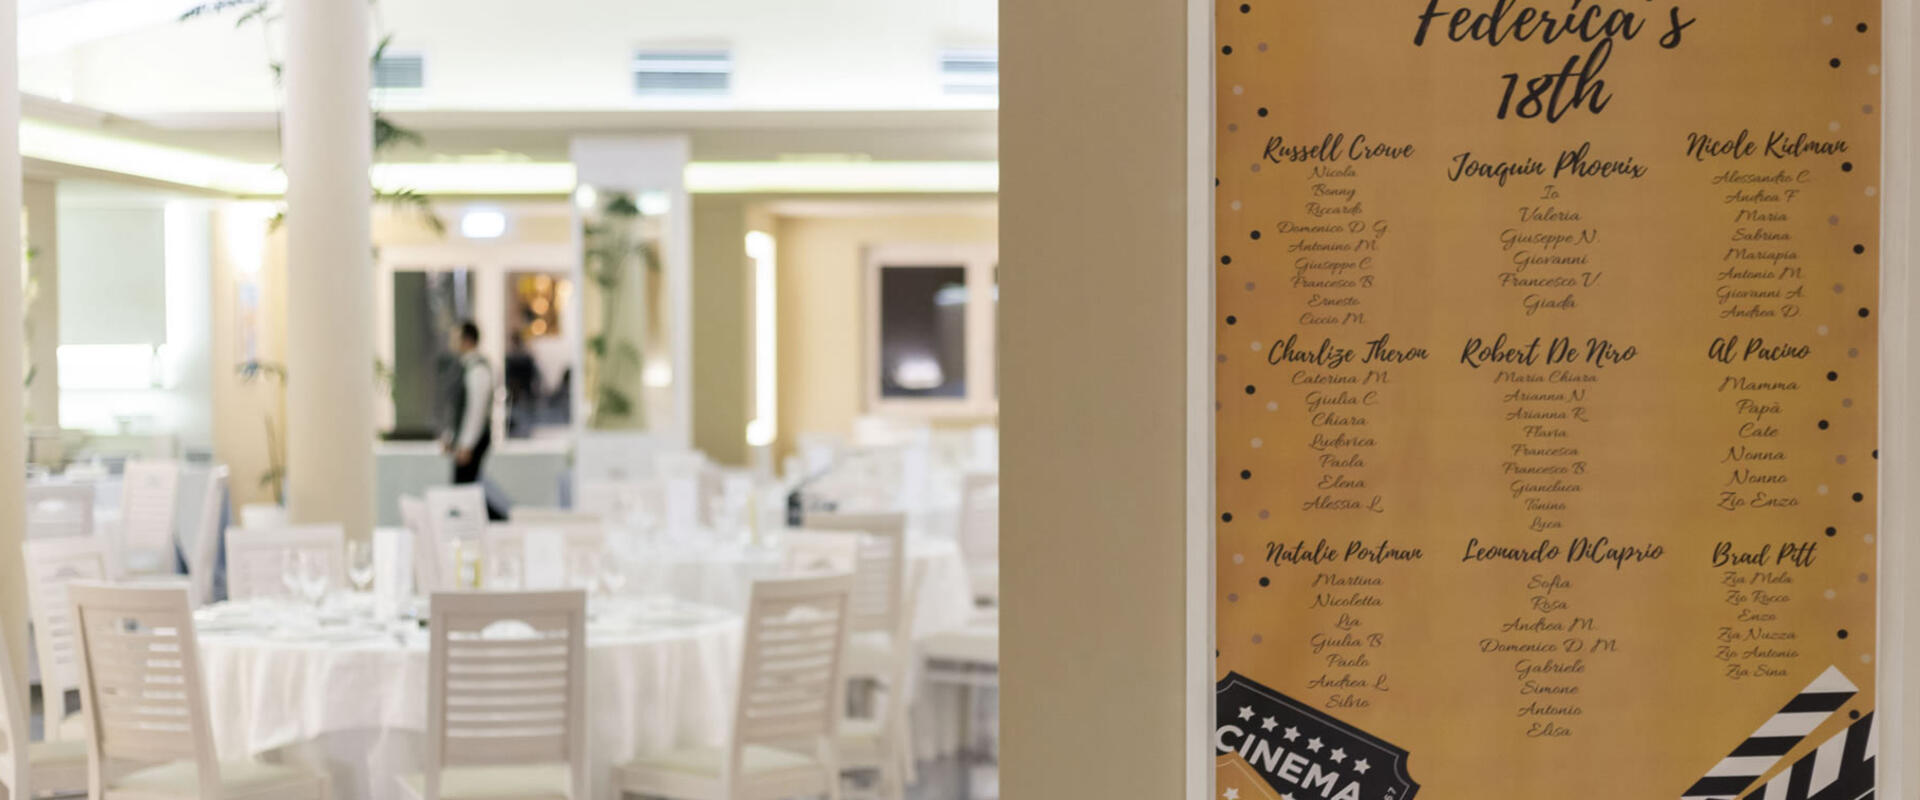 borgodonnacanfora it location-eventi-calabria 003